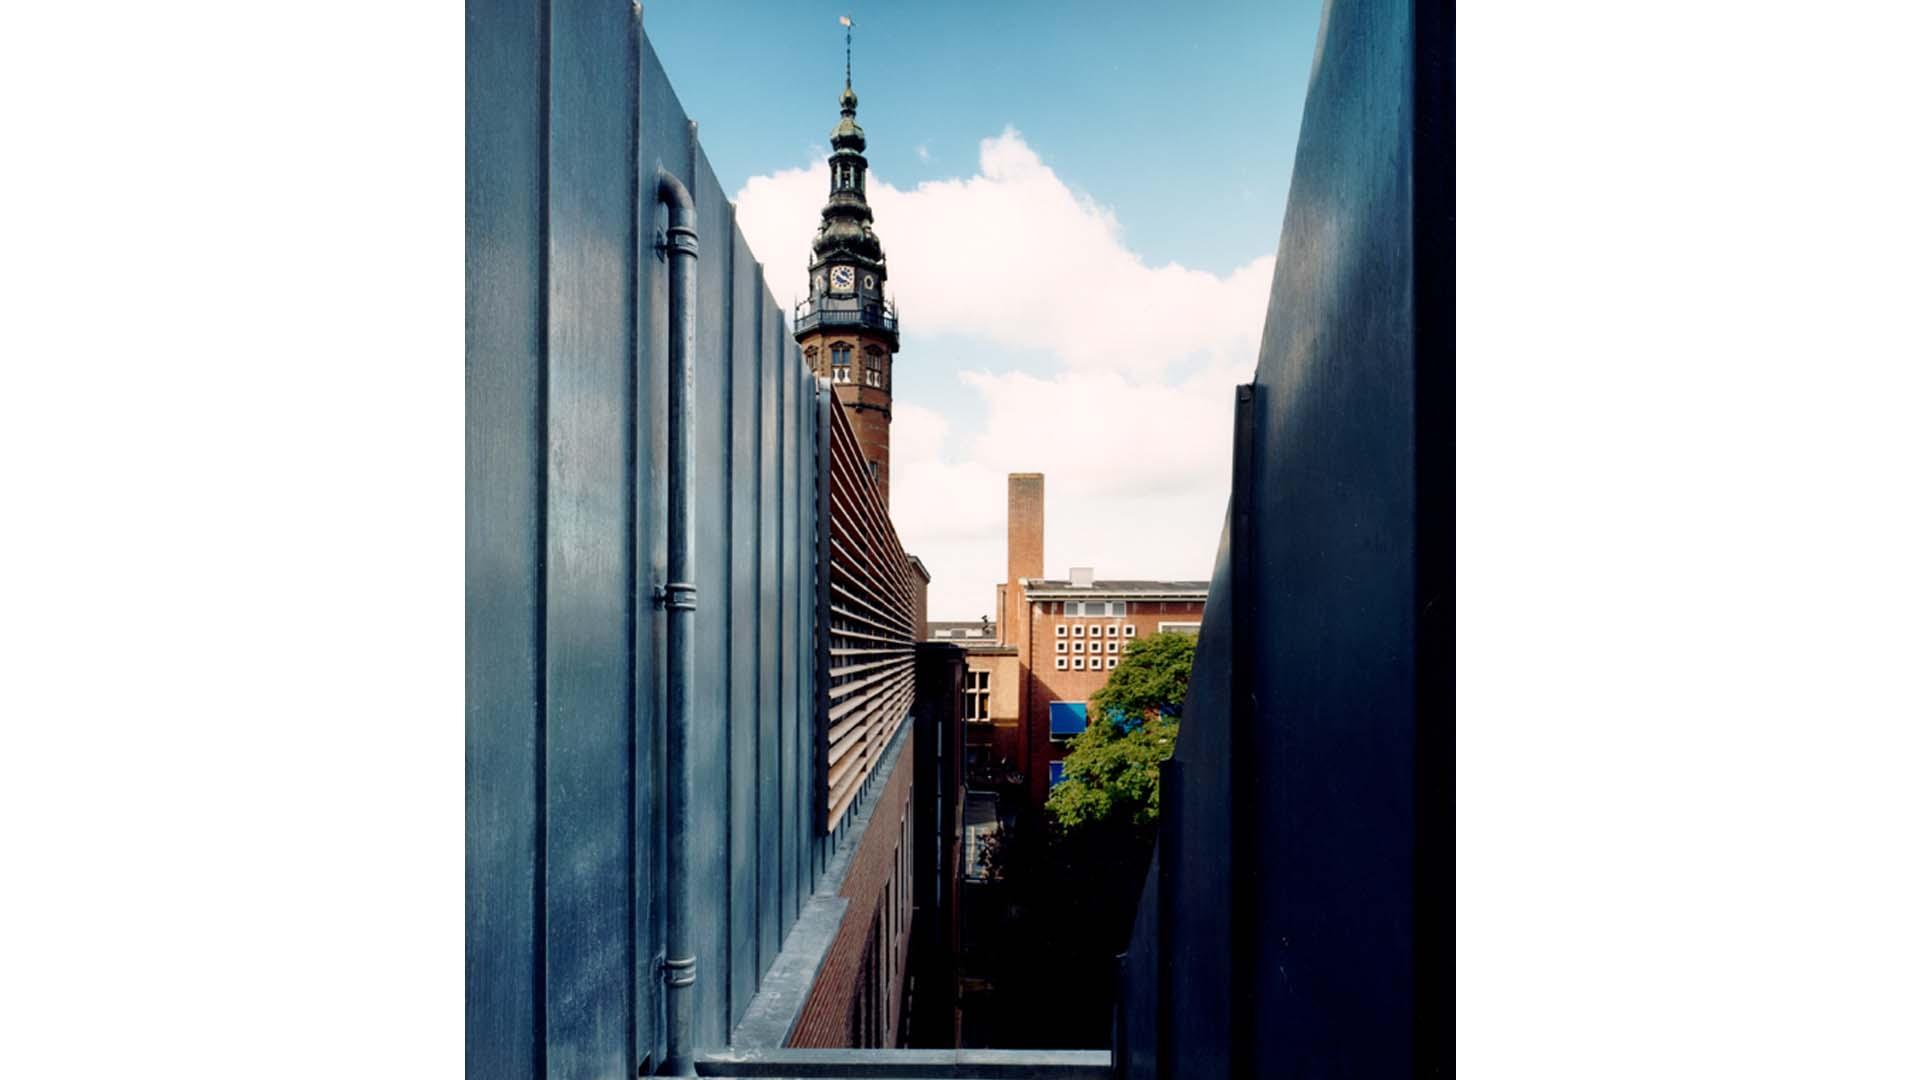 0003_Faculteit Theologie RUG Groningen_03